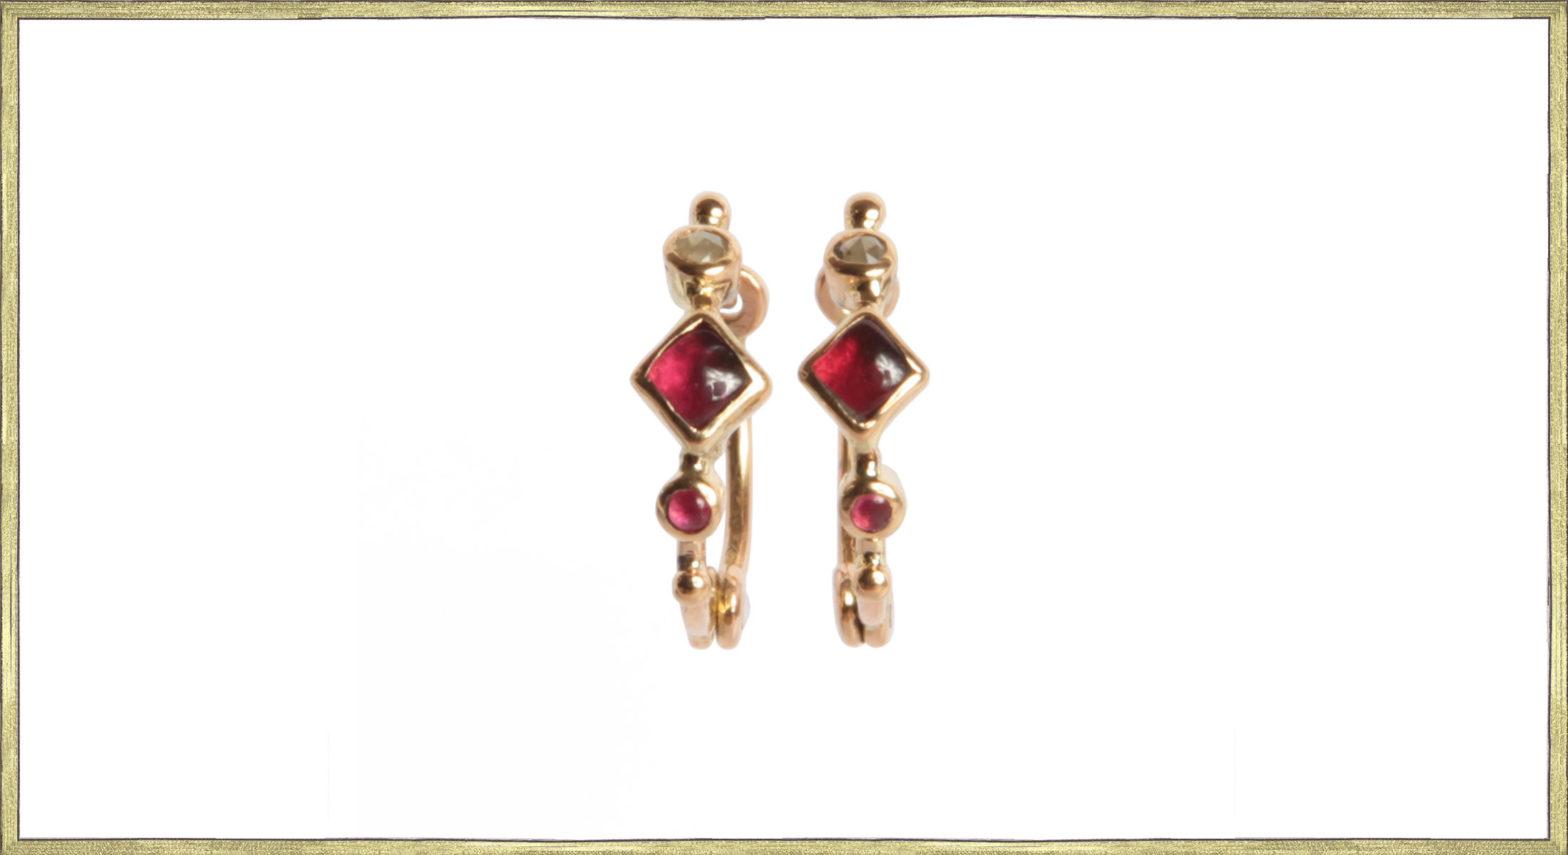 Anneaux / Simples earrings